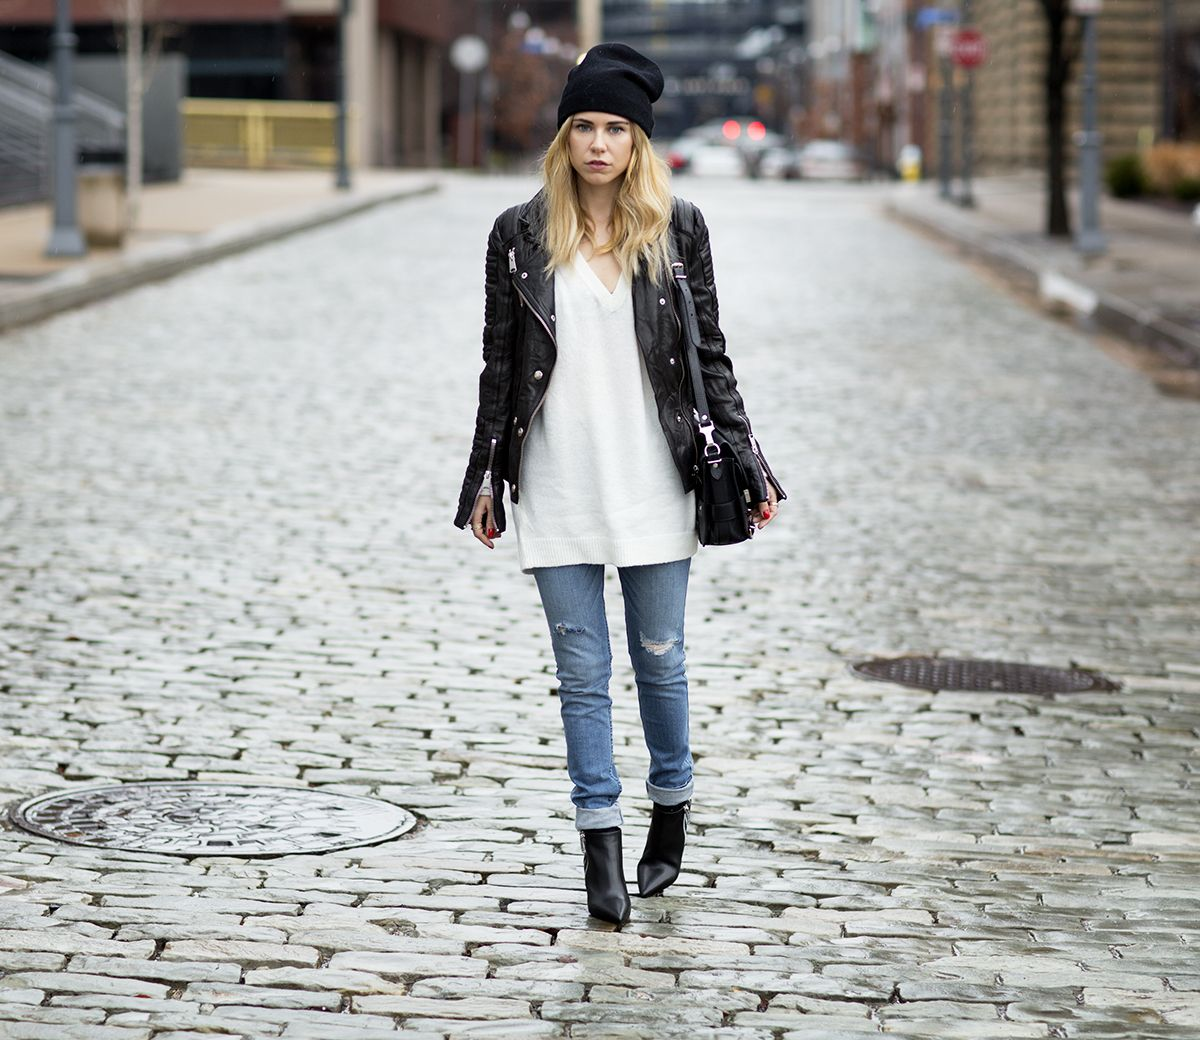 ALWAYSJUDGING / ROOTS //  #Fashion, #FashionBlog, #FashionBlogger, #Ootd, #OutfitOfTheDay, #Style